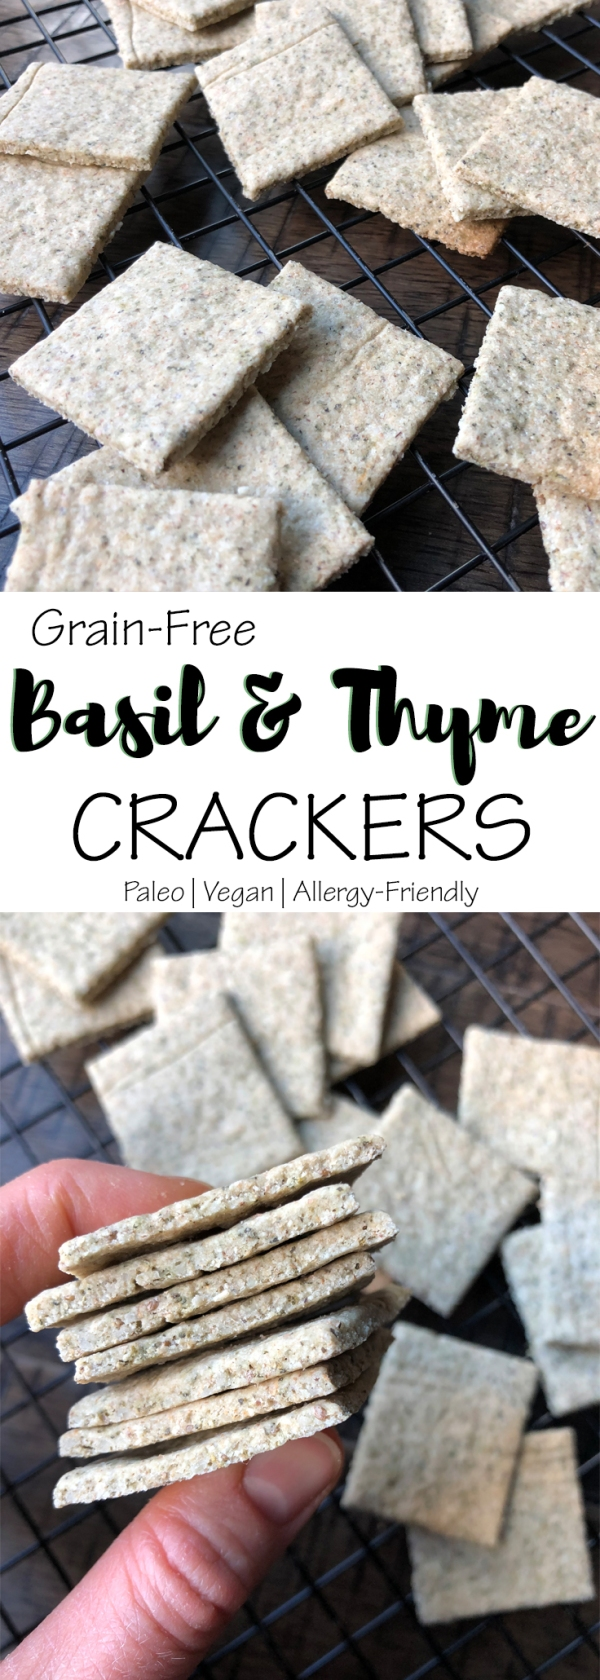 Basil & Thyme Grain-Free Crackers